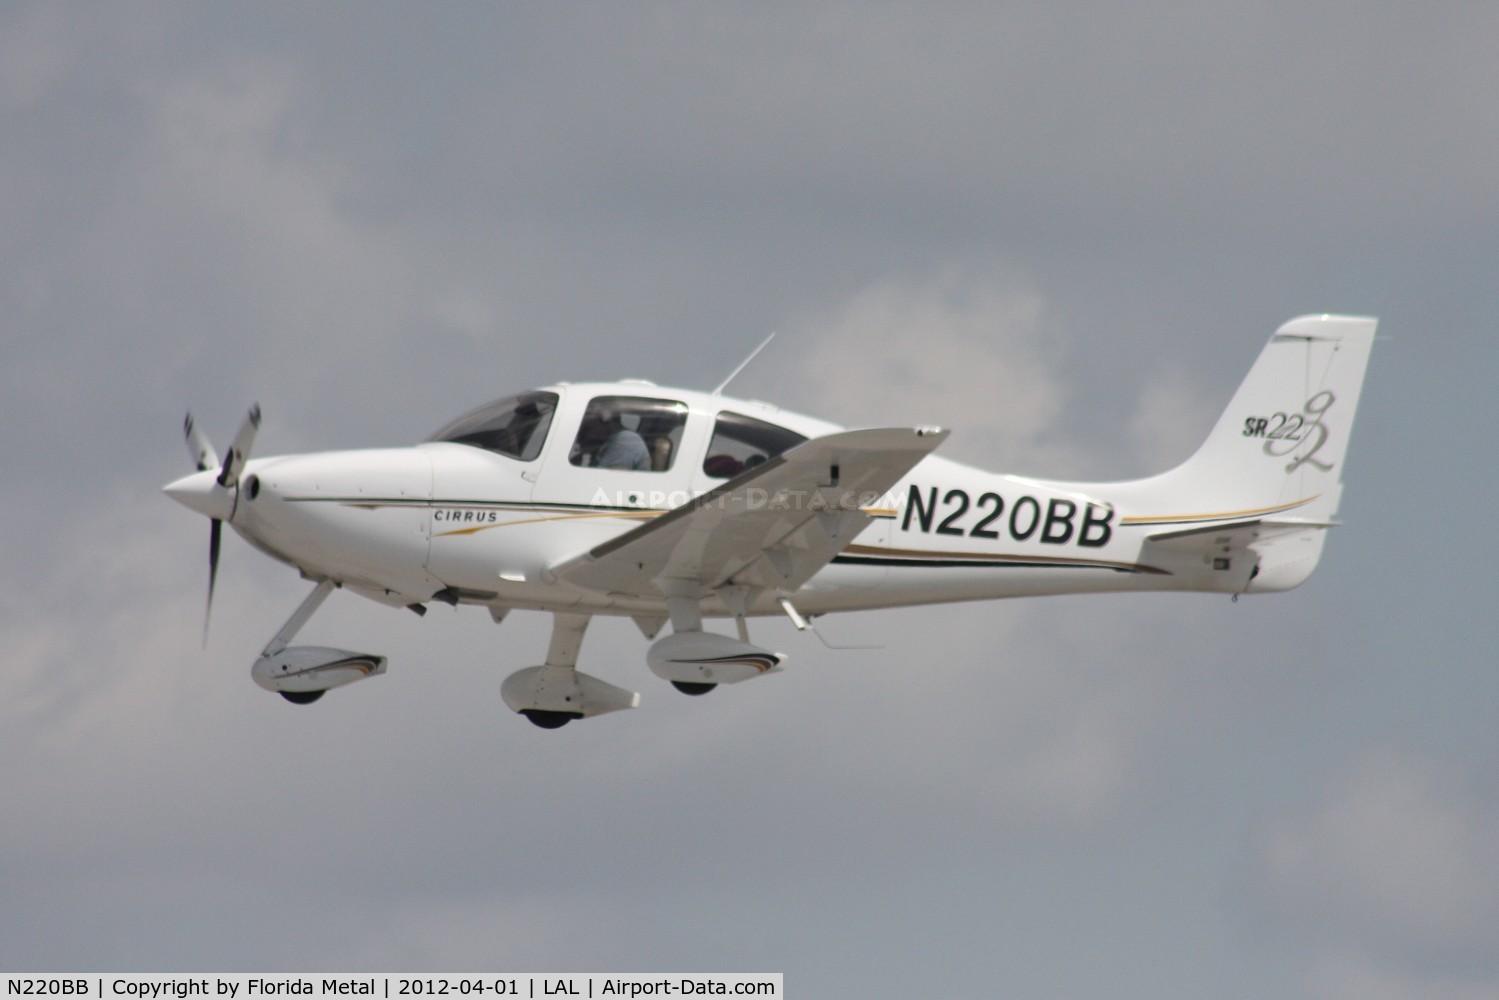 N220BB, 2004 Cirrus SR22 G2 C/N 1097, Cirrus SR22